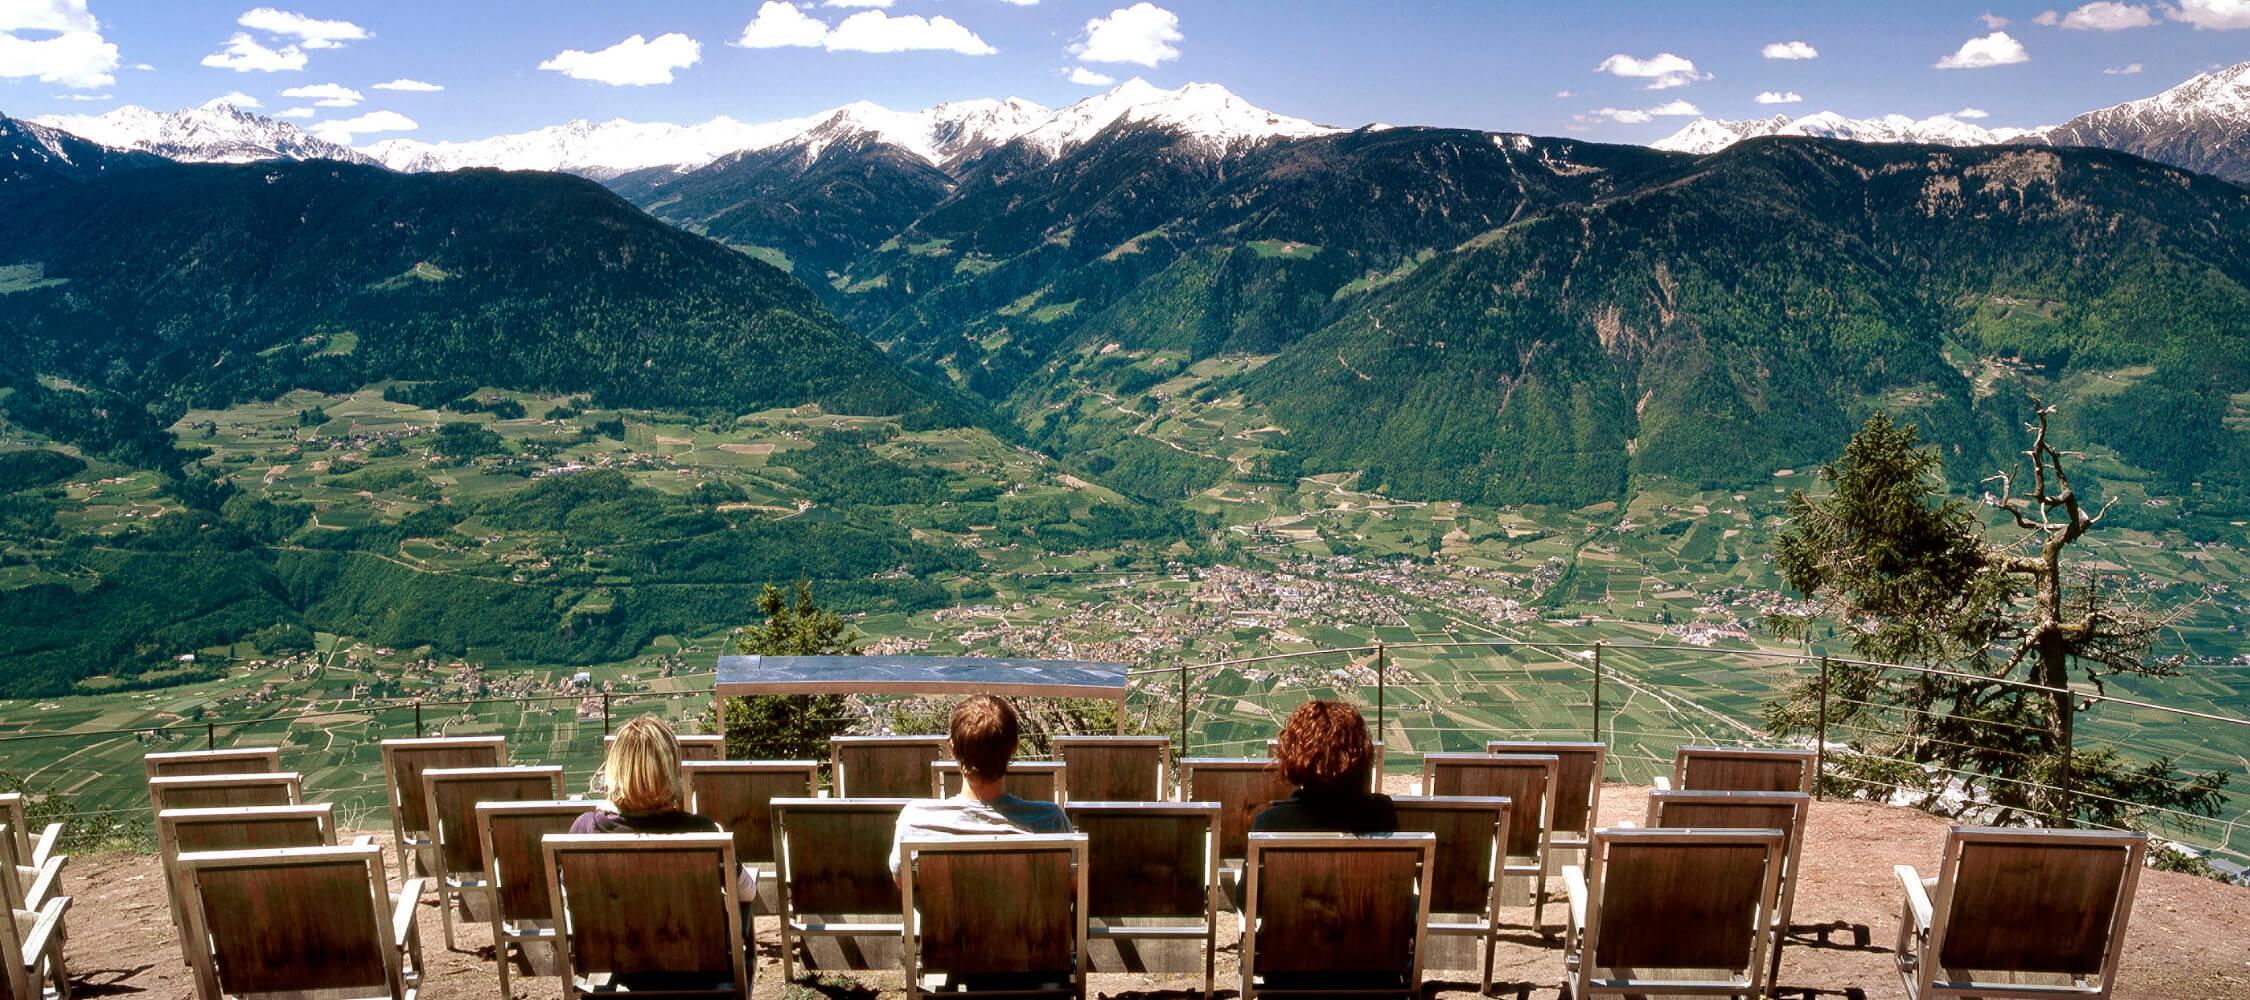 Italien-Trentino_Suedtirol_Alto_Adige_Merano_Meran_Natur_Besichtigen_Knottnkino_Panorama_Talkessel_IDM-Clemens-Zahn_smg00691clza_2250x1000